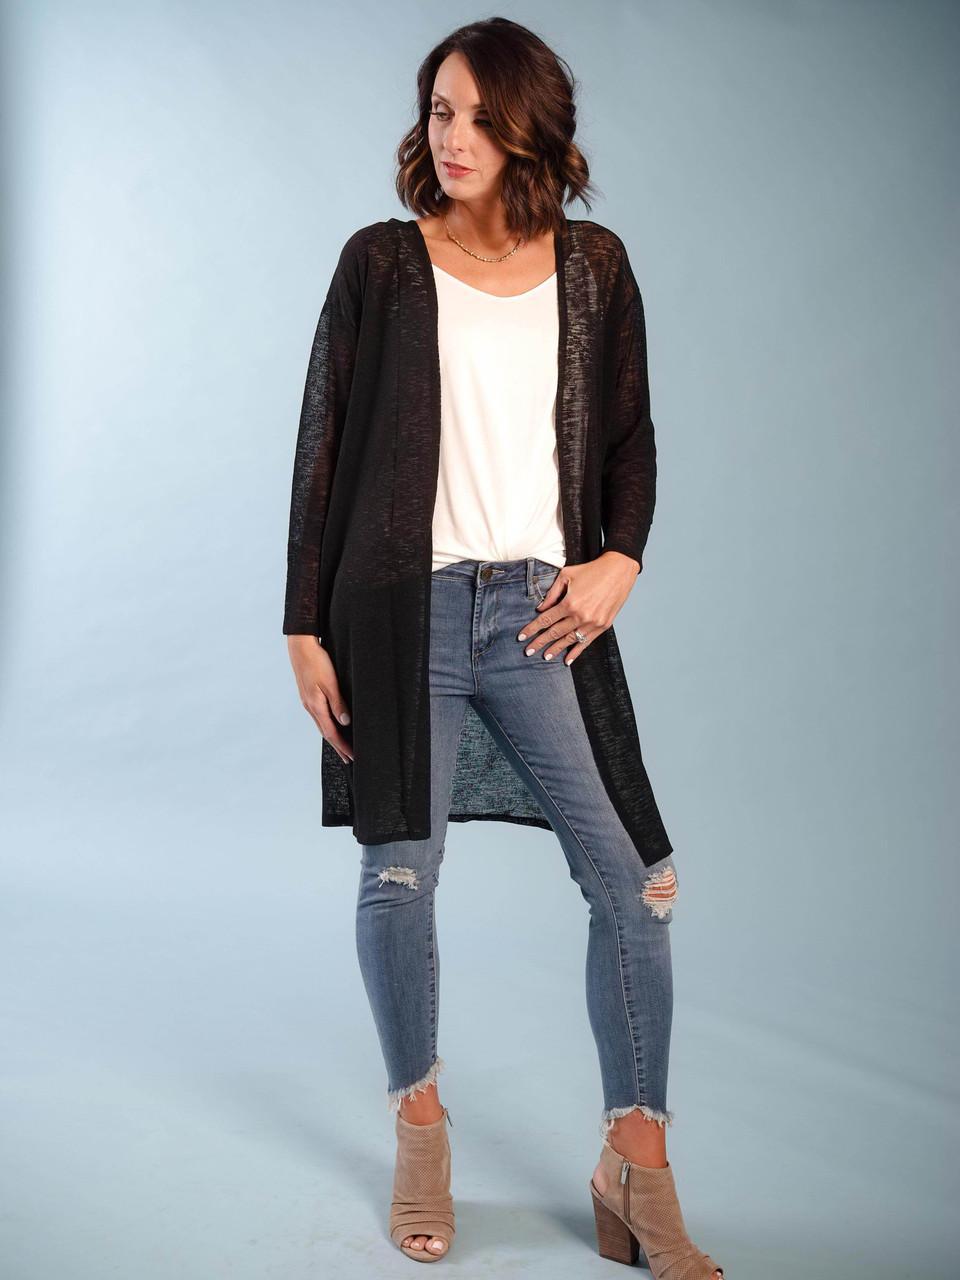 articles of society frayed asymmetrical hem jeans